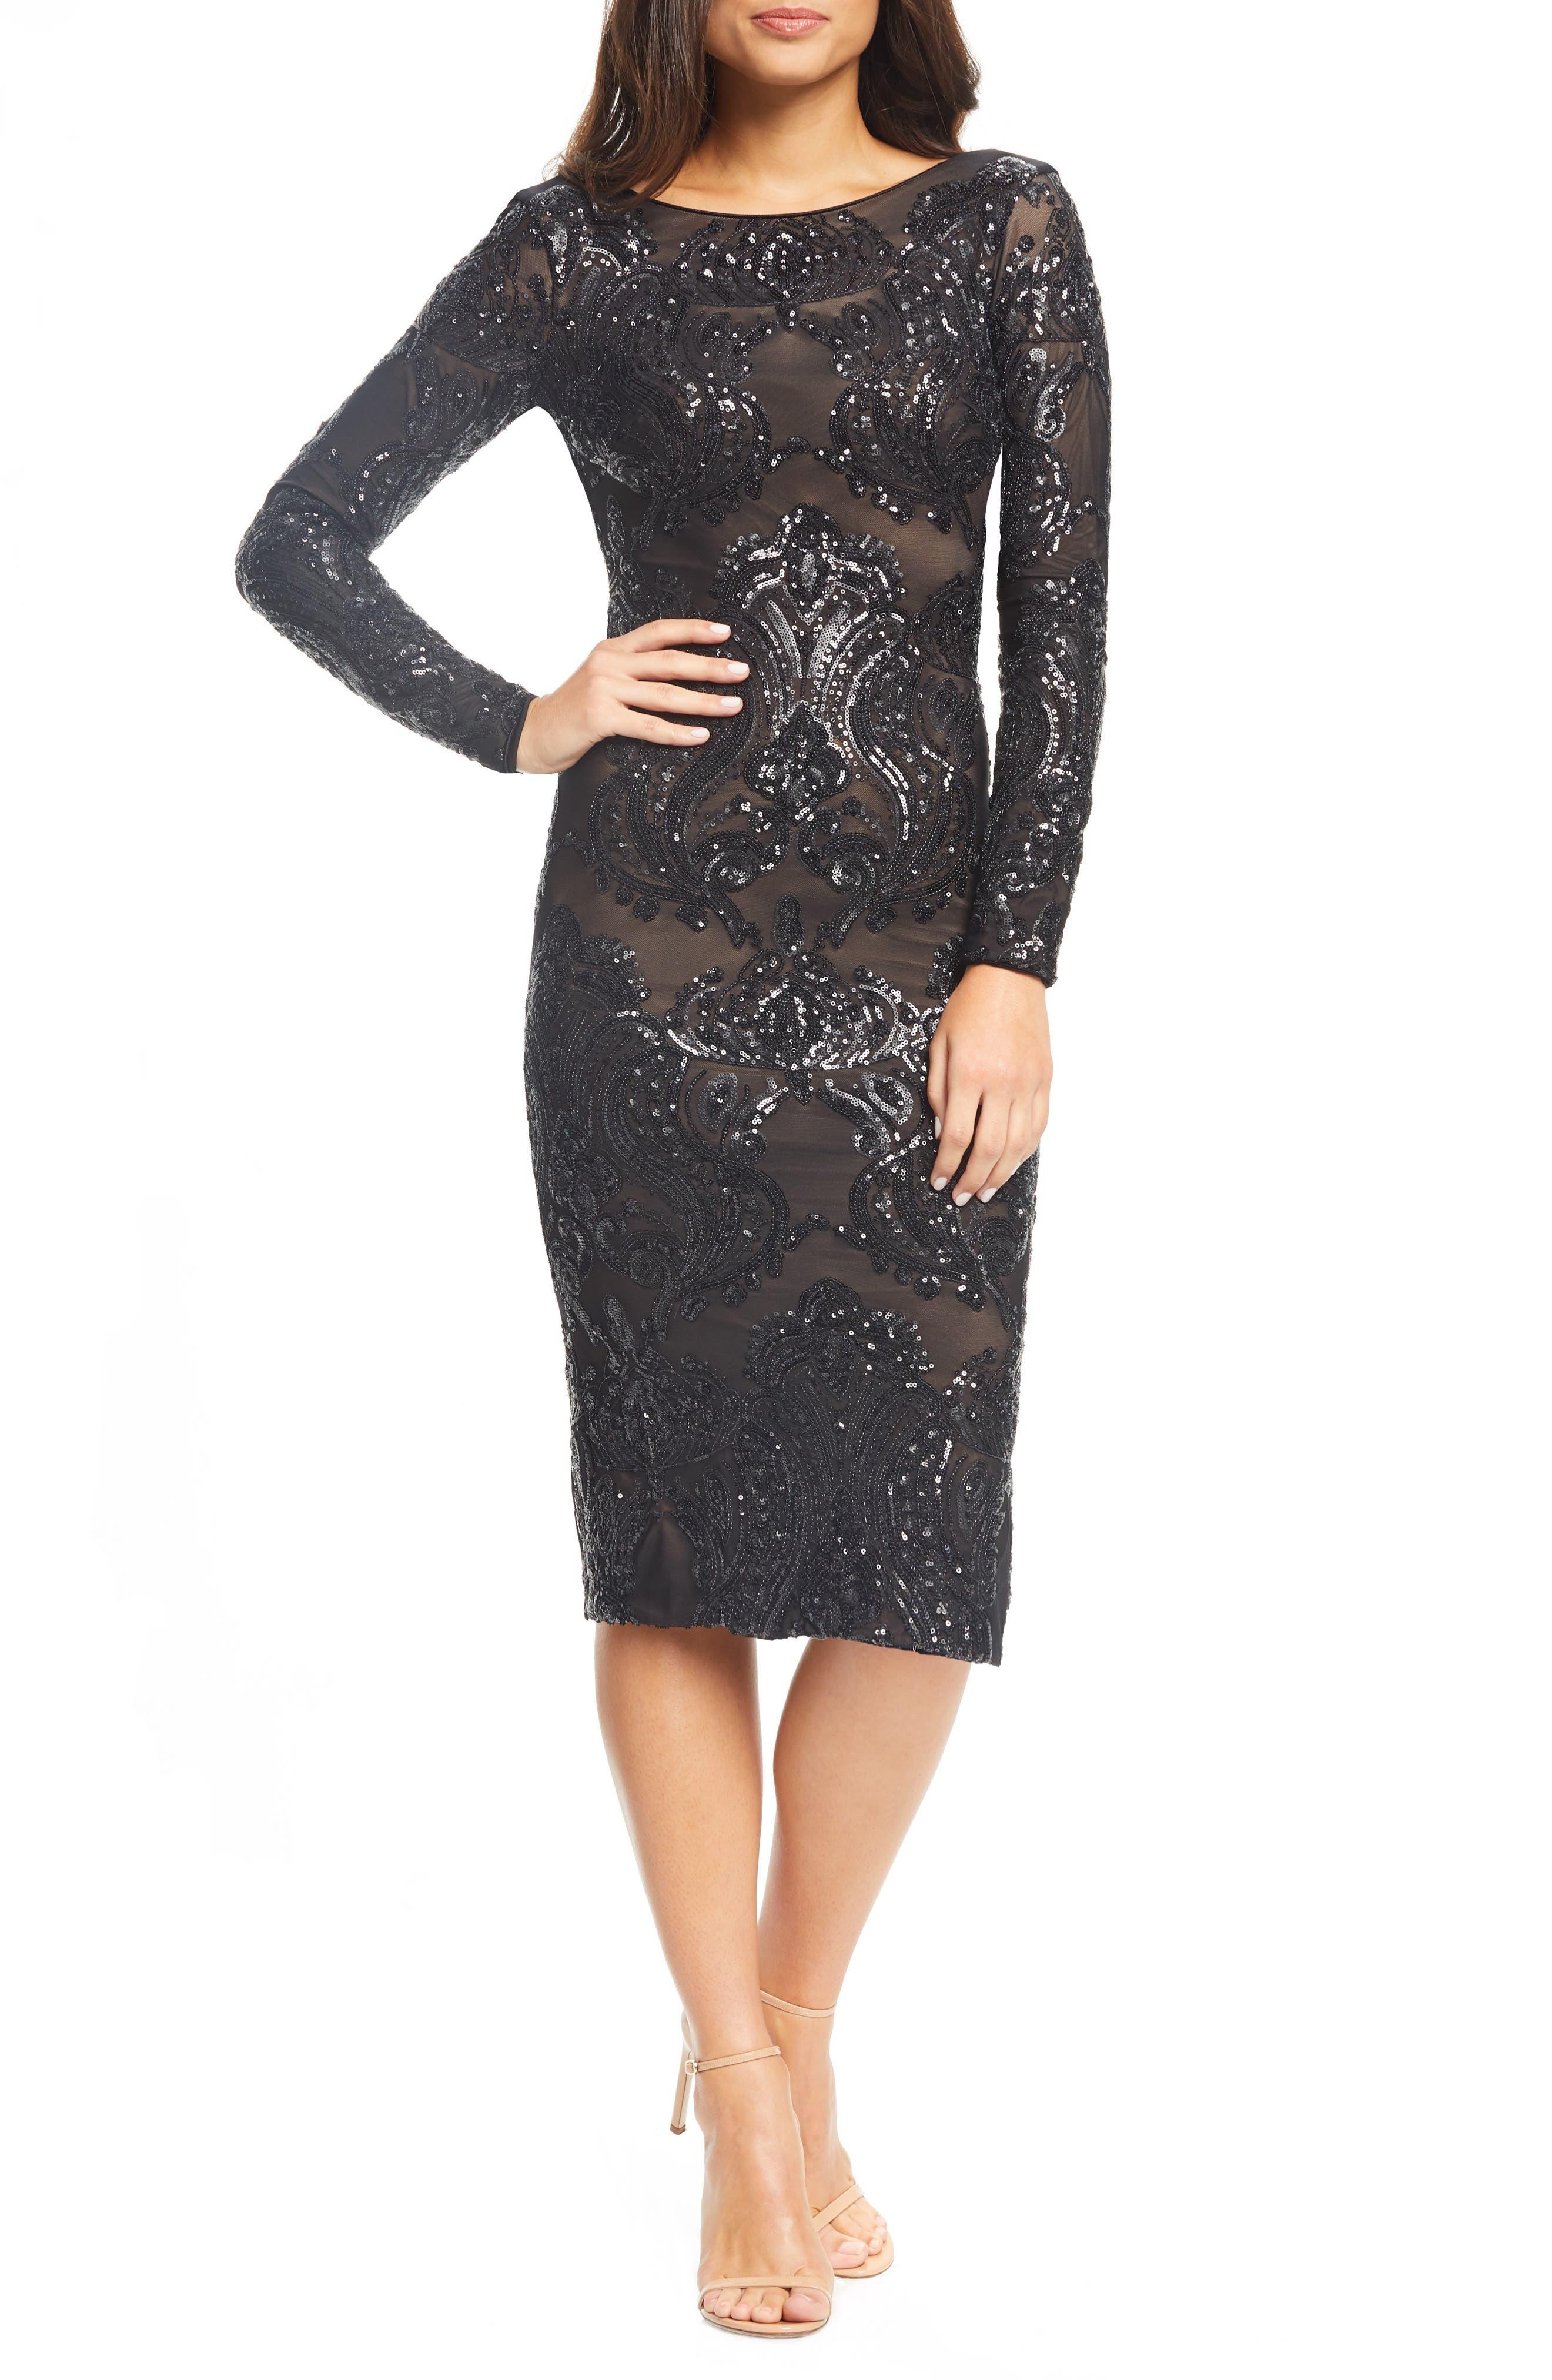 DRESS THE POPULATION Emery Sequin Sheath Dress, Main, color, BLACK/ NUDE